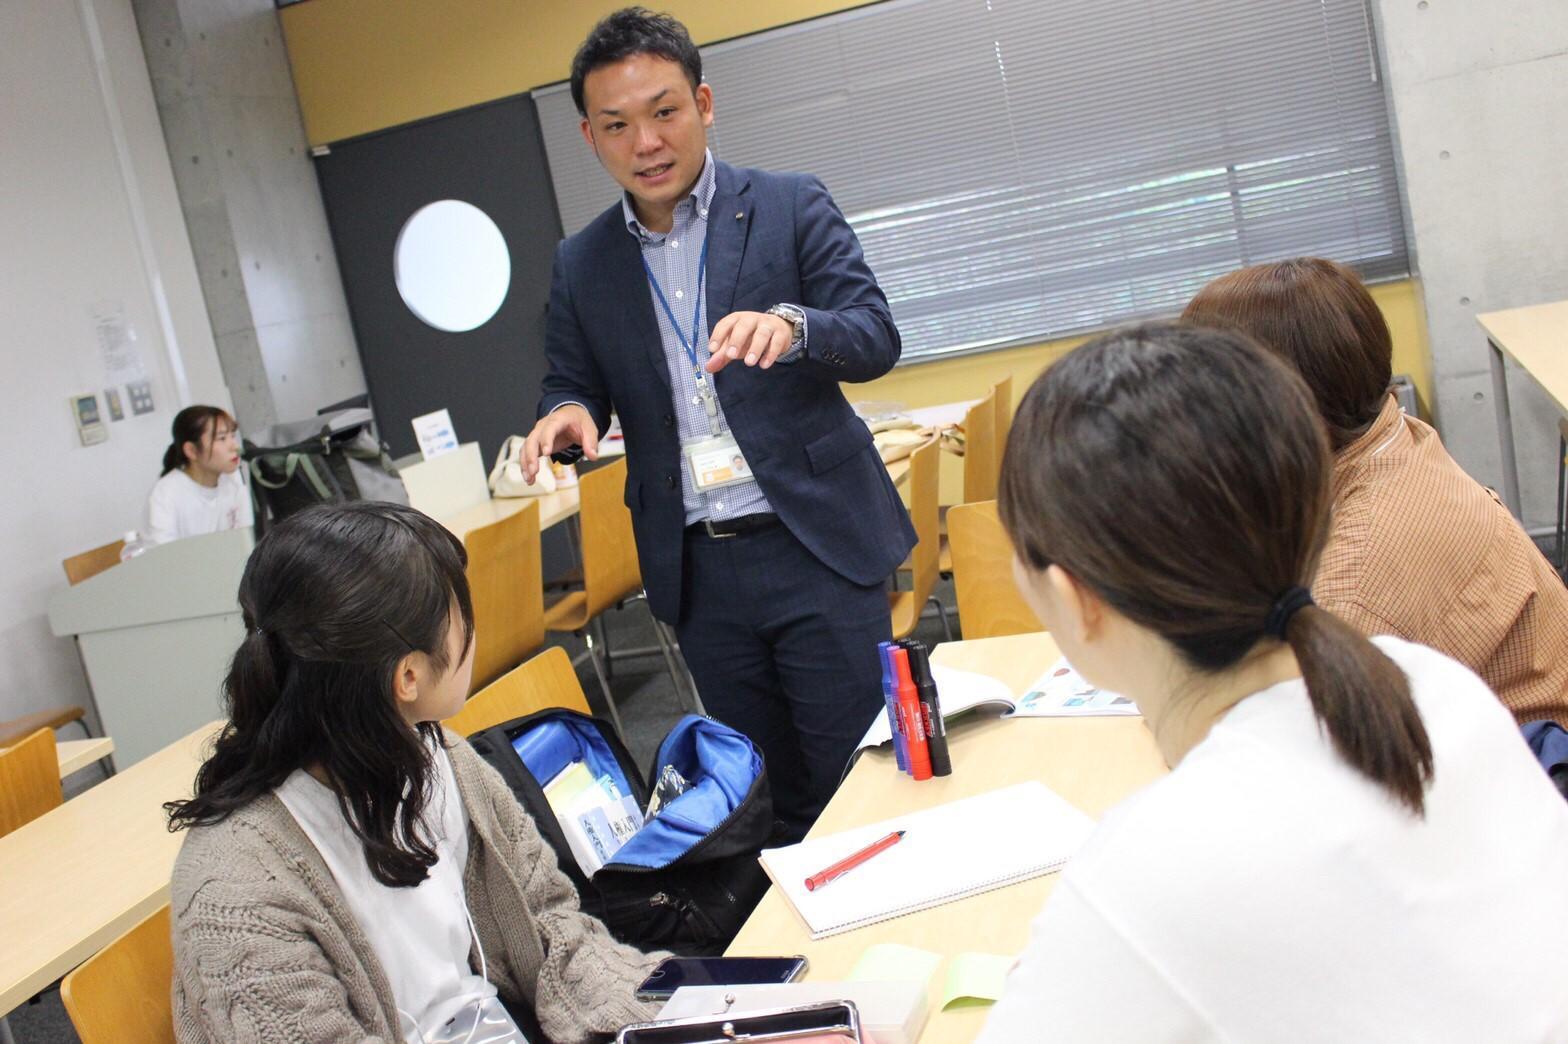 Learning Assistant Programでリーダーシップ・コミュニケーション能力向上=淑徳大学が株式会社エイチ・アイ・エス様と連携、9割の経営学部生が受講